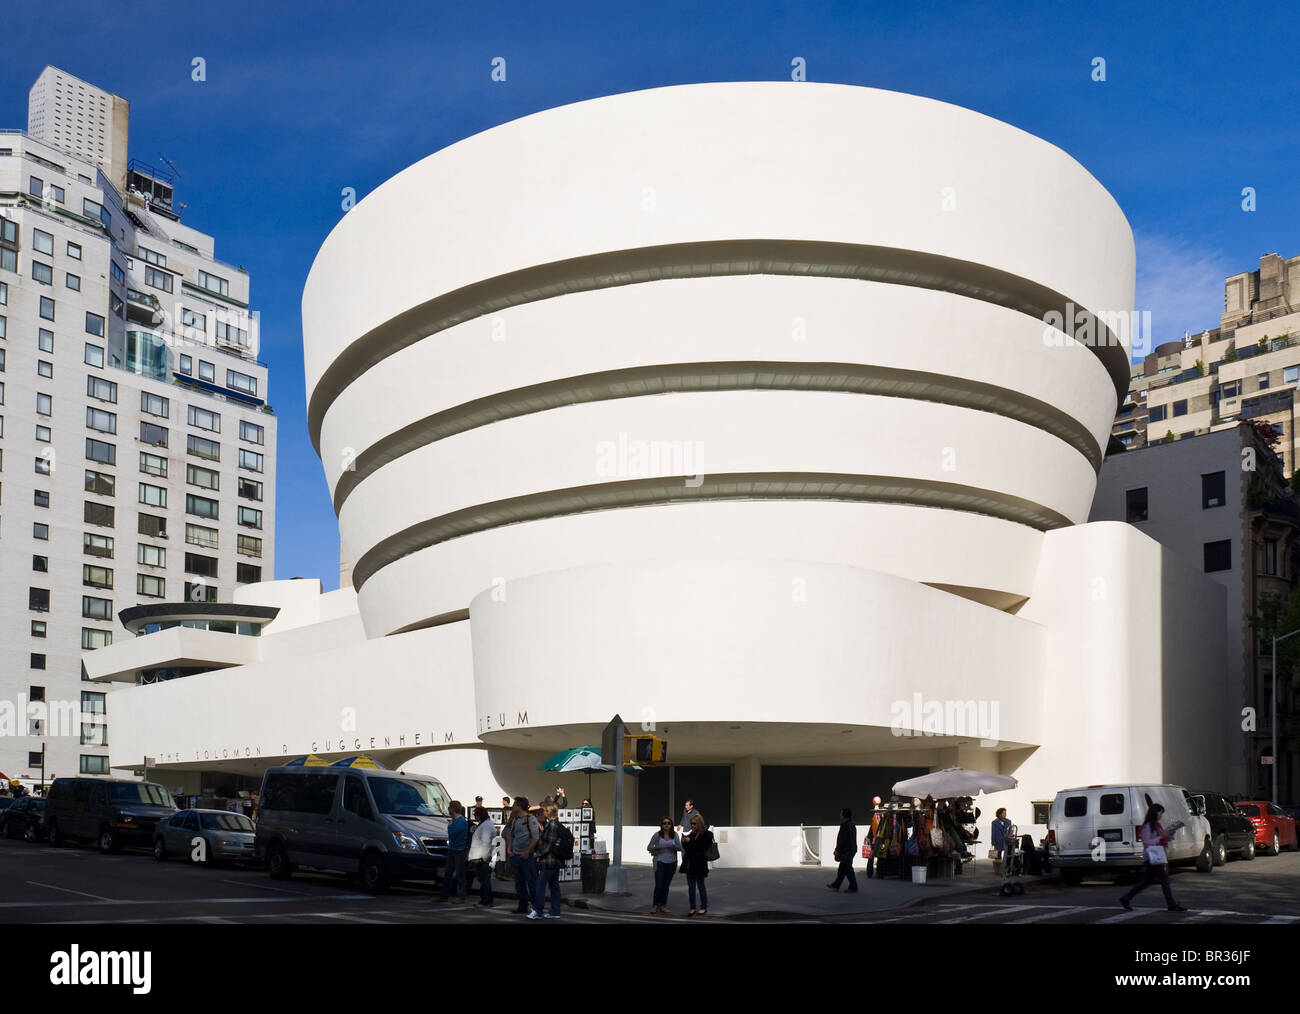 the guggenheim museum new york city frank lloyd wright architect